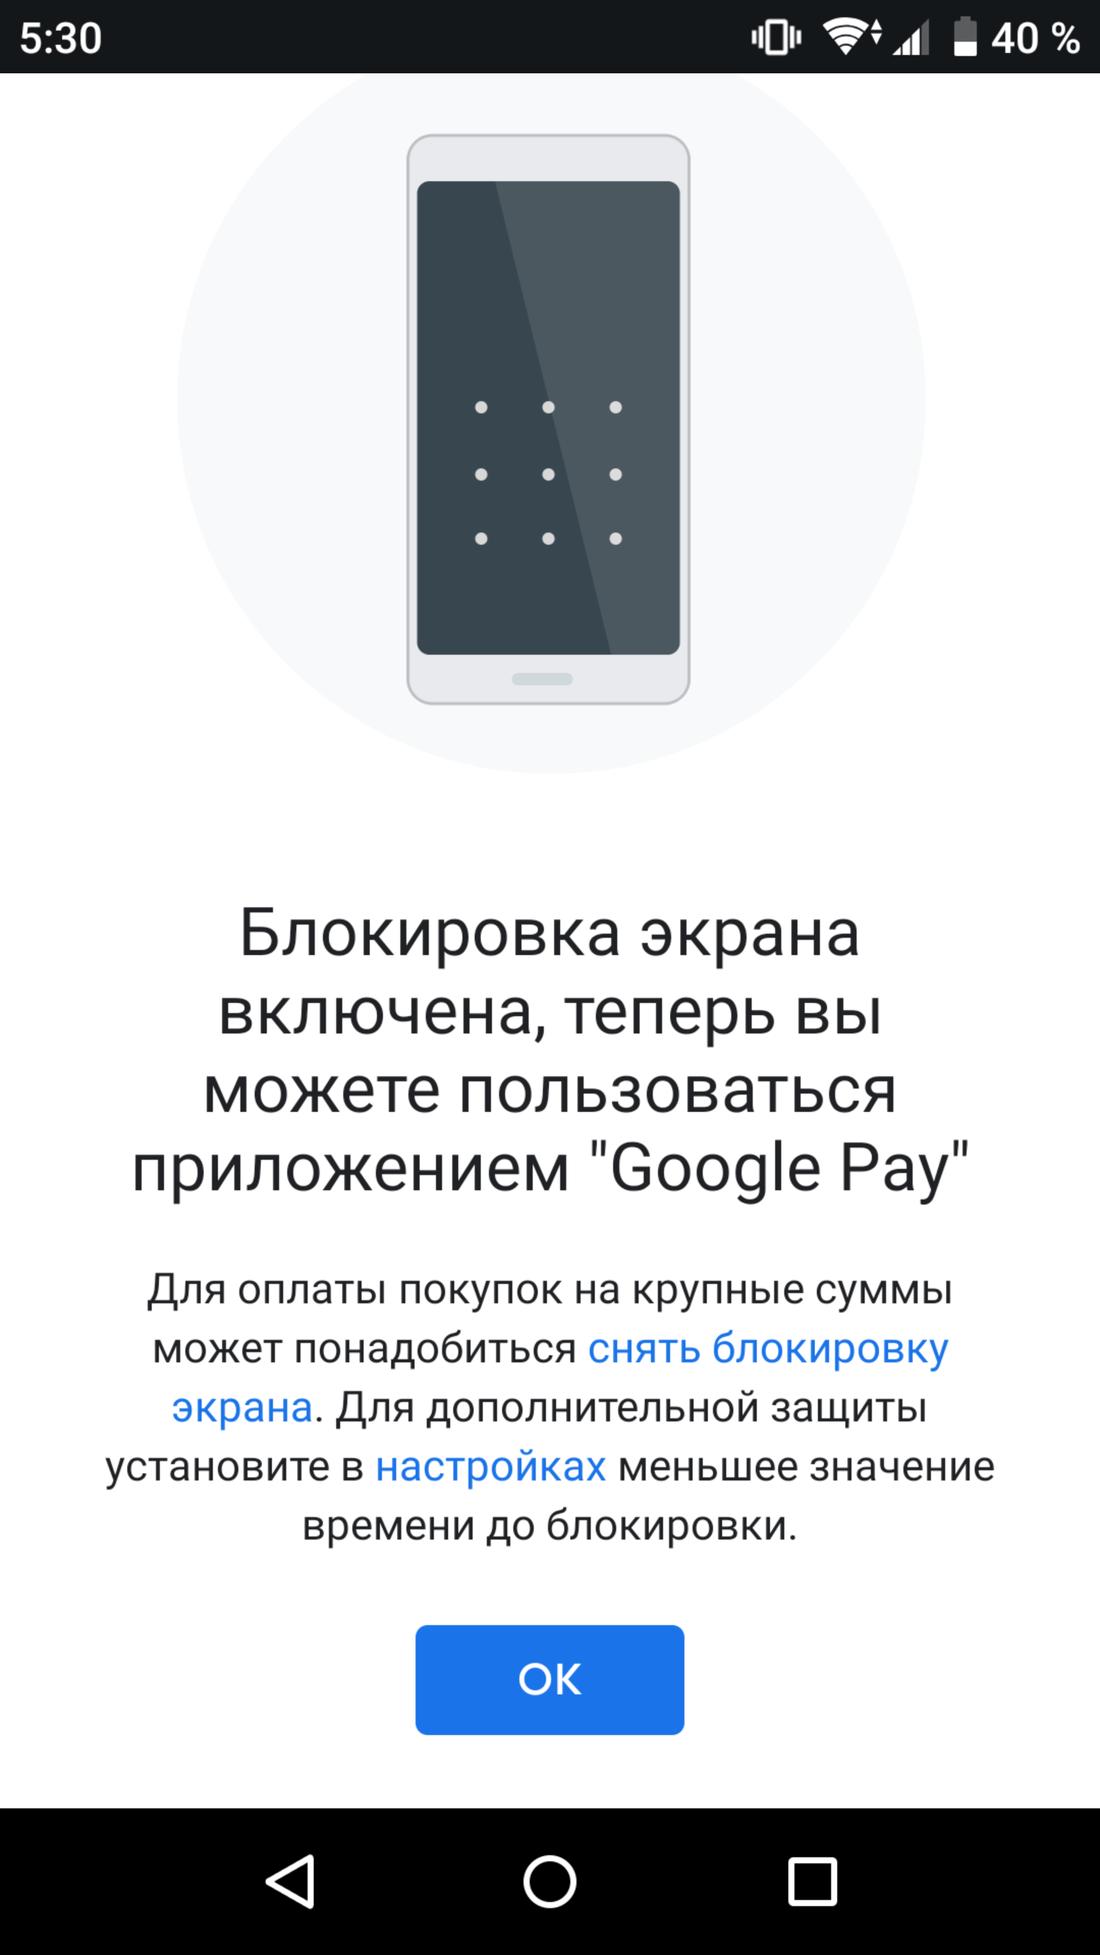 Скриншот #2 из программы Google Pay